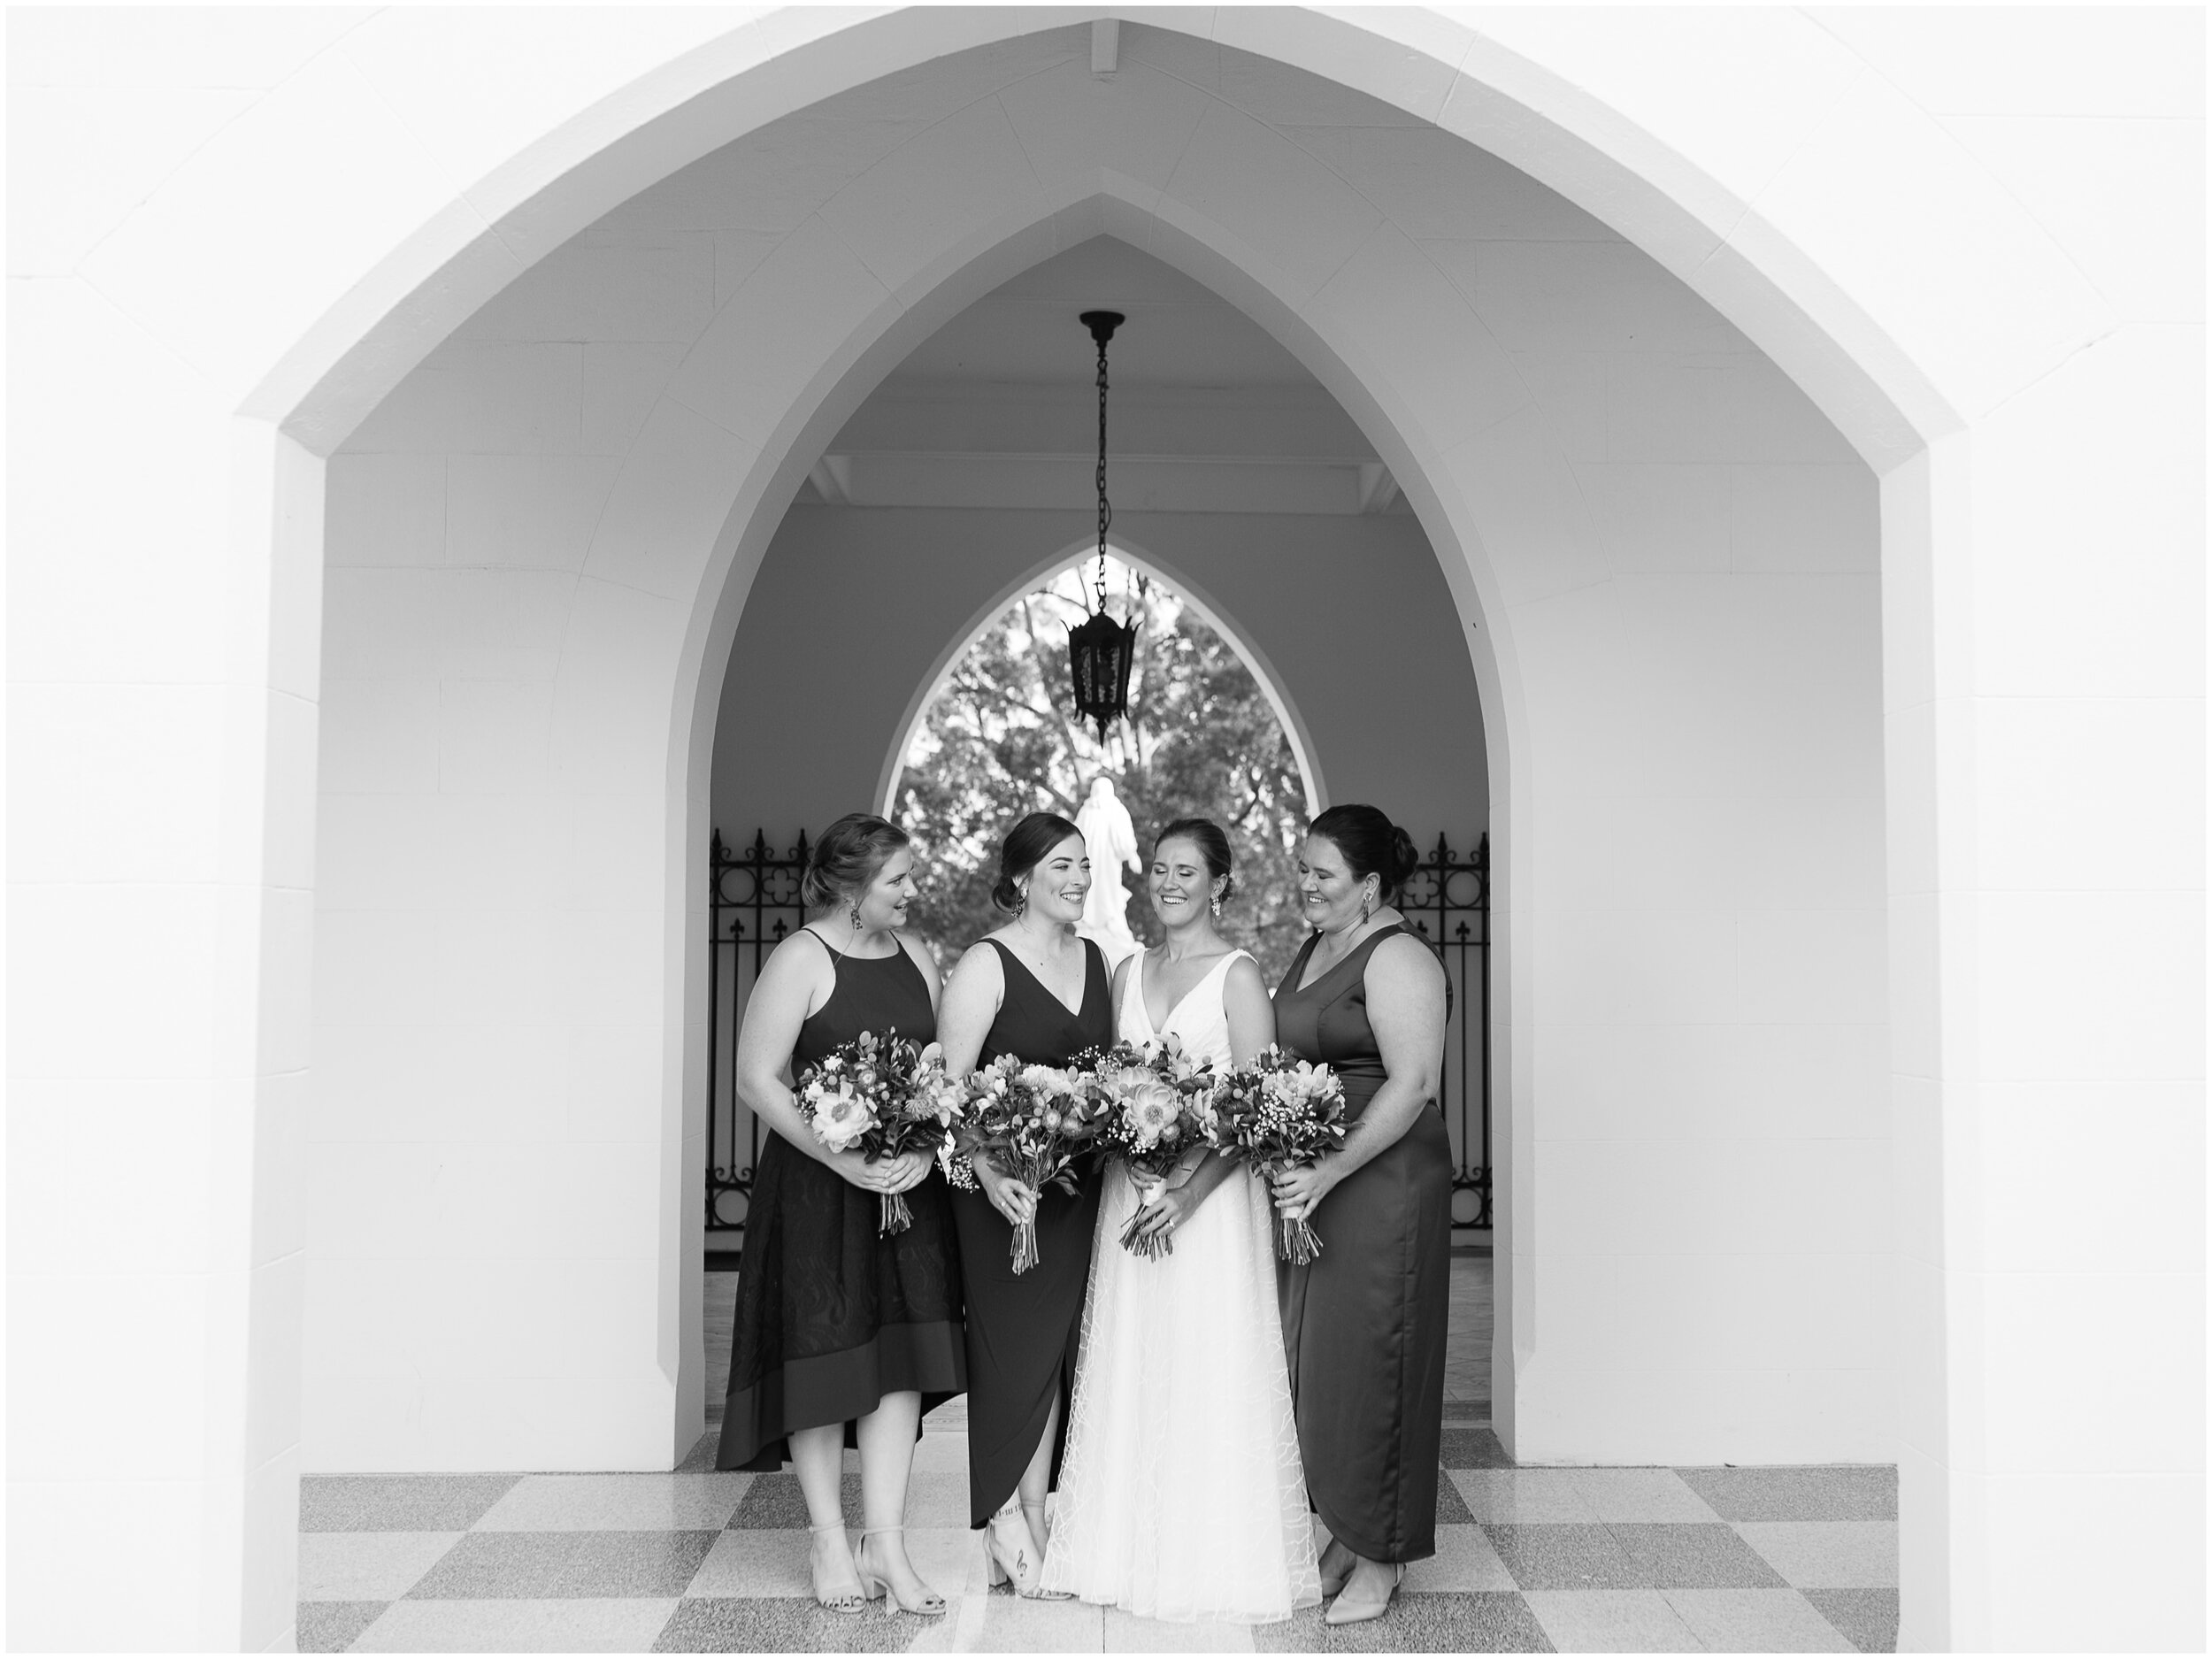 fine-art-australian-destination-wedding-photographer-24.jpg